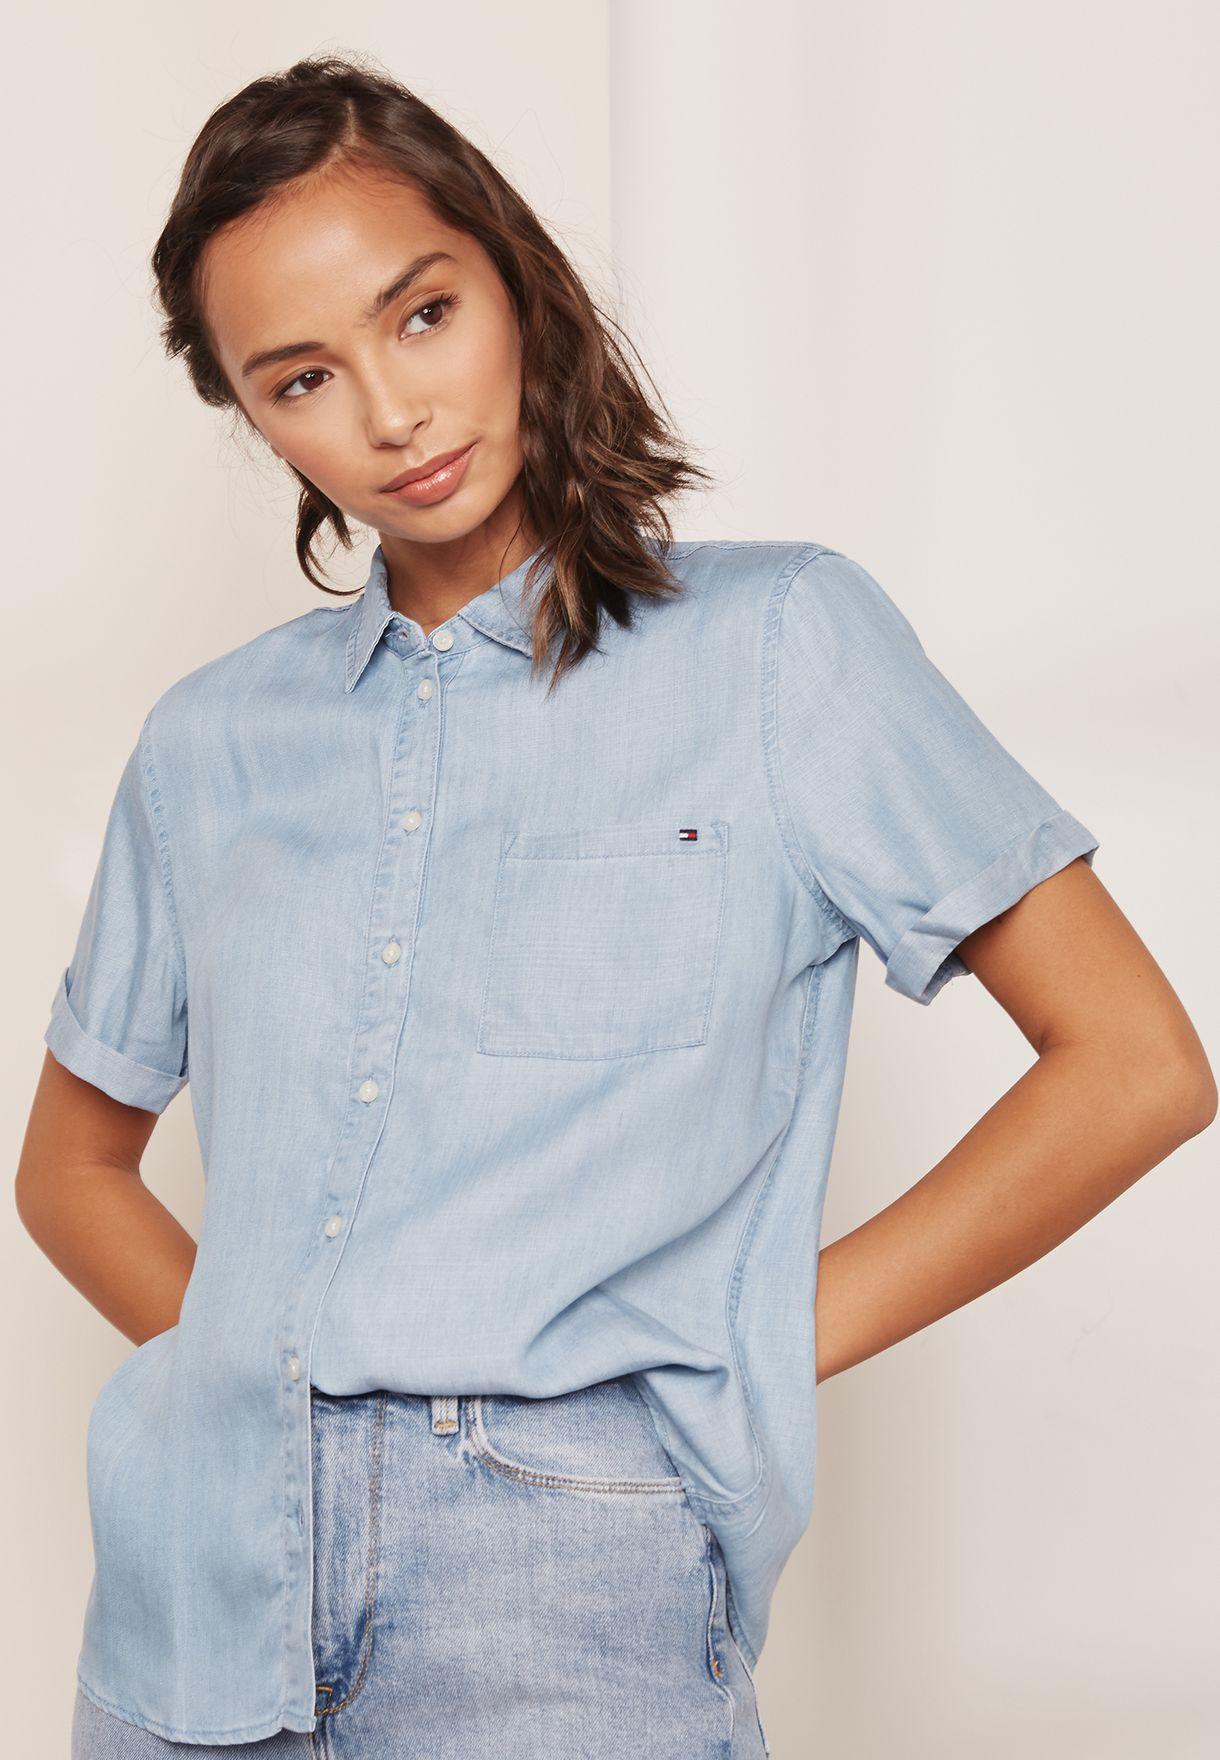 73494c61 Shop Tommy Hilfiger blue Jena Denim Shirt WW0WW22601 for Women in ...